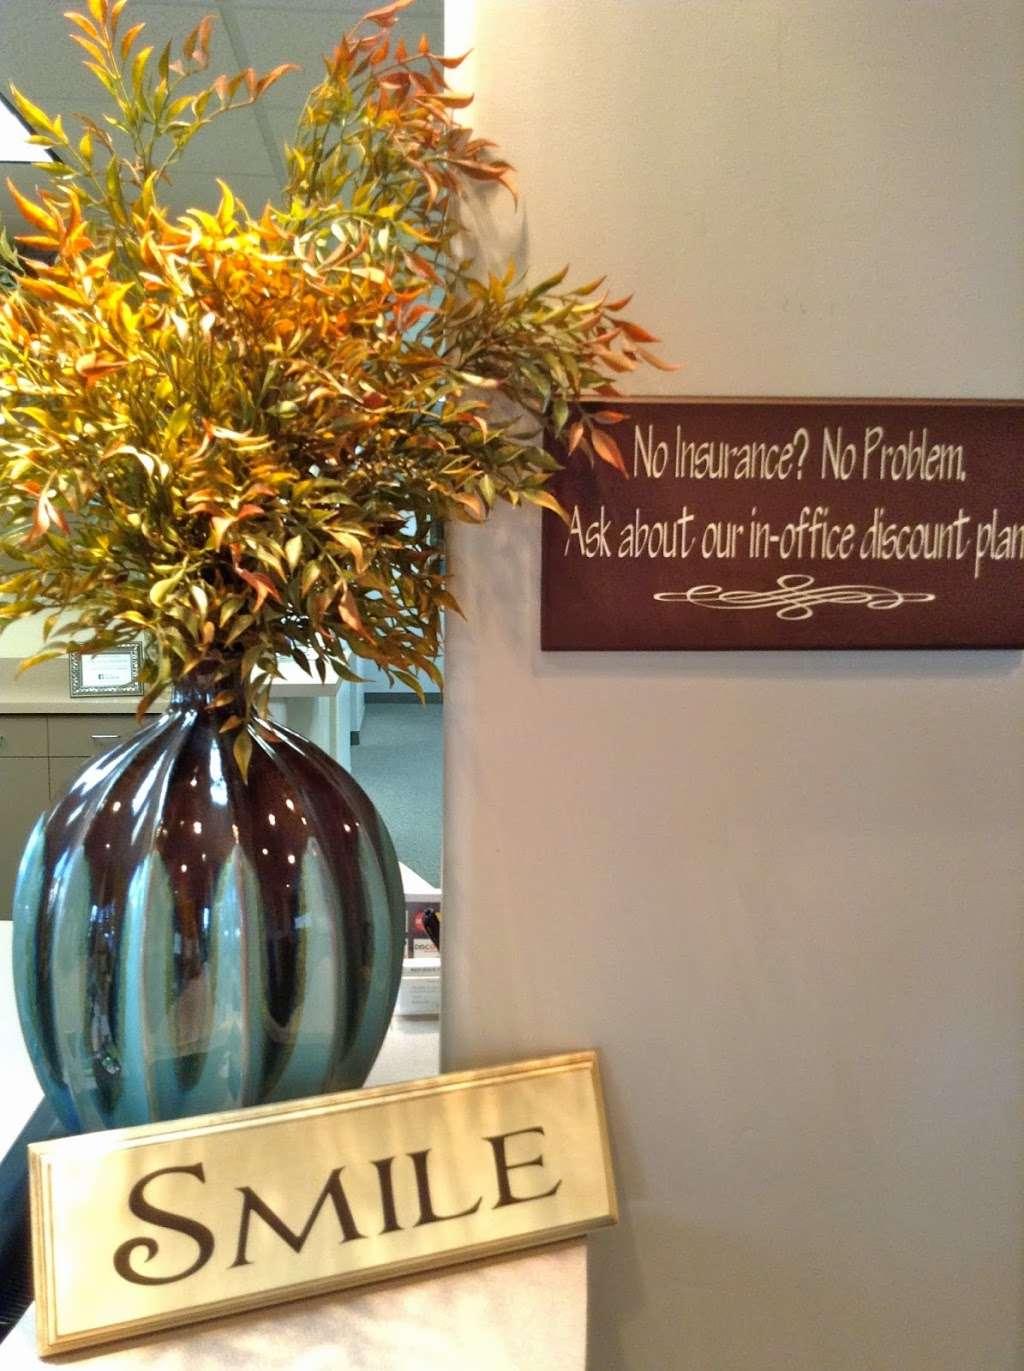 Red Rock Family Dentistry - dentist  | Photo 8 of 10 | Address: 908 W Chandler Blvd # C-7, Chandler, AZ 85225, USA | Phone: (480) 782-8111